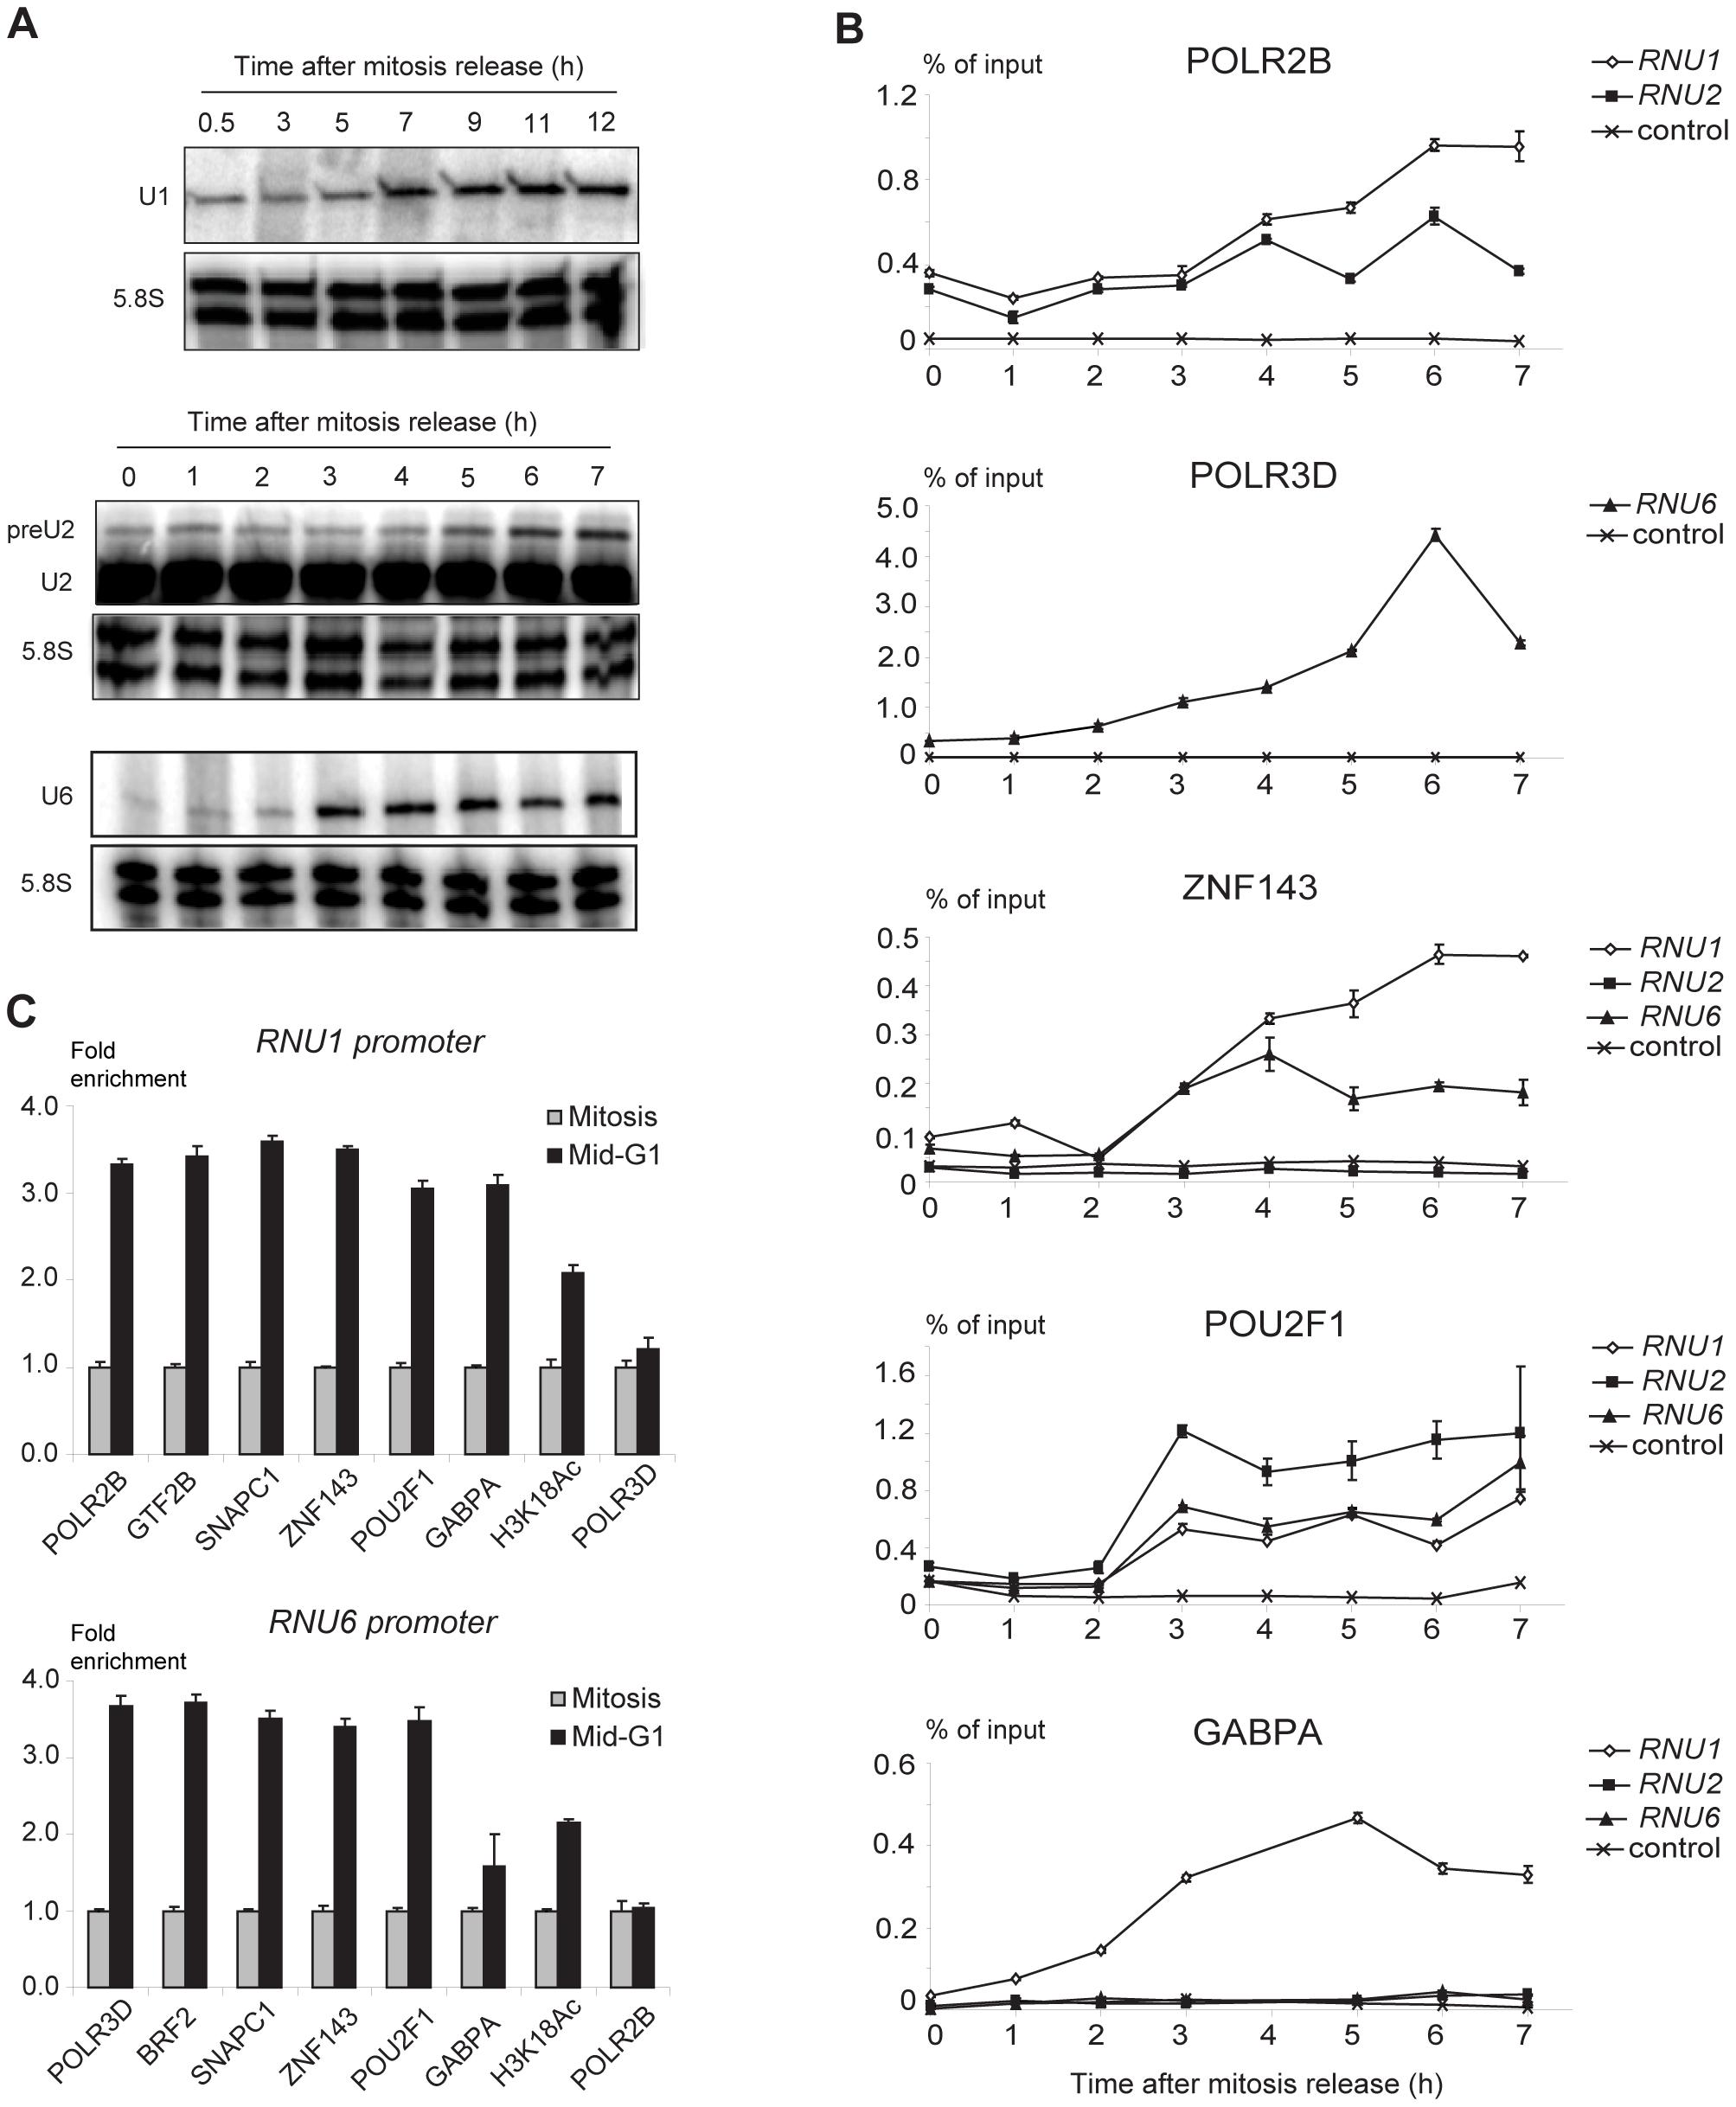 <i>RNU1</i>, <i>RNU2</i>, and <i>RNU6</i> transcription and factor recruitment during mitosis to G1 phase transition.